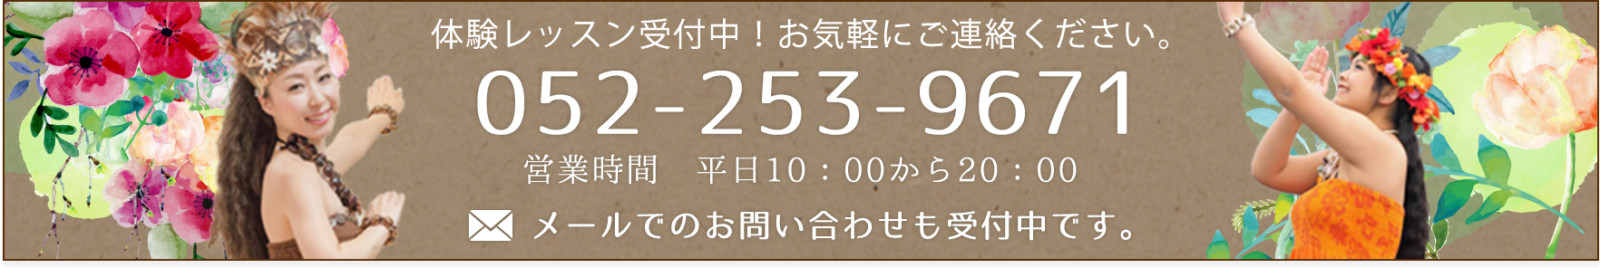 main_banner_01 第65回広小路夏祭り出演 | タヒチアンダンス テマラマタヒチ名古屋